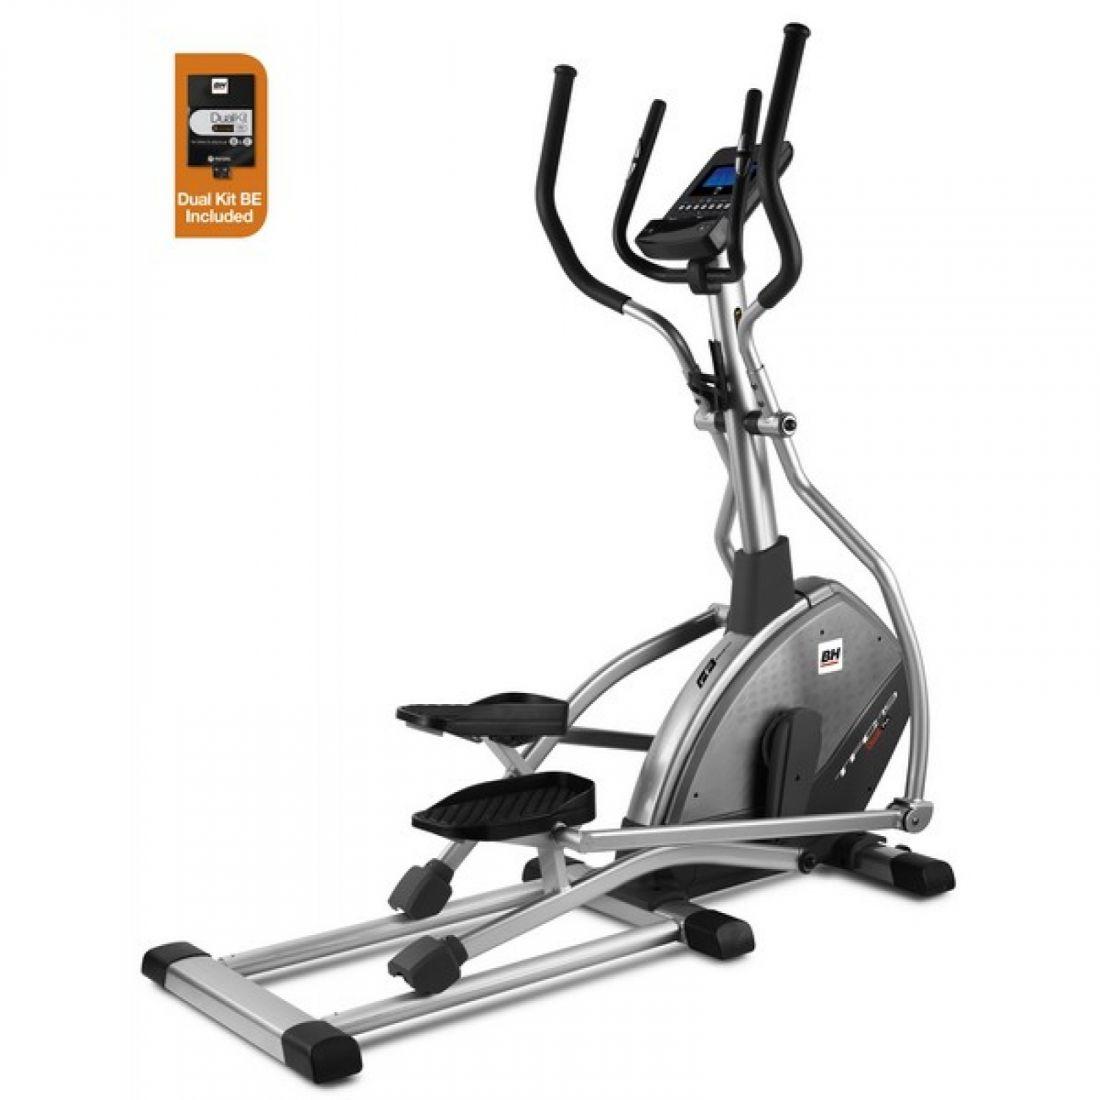 BH Fitness TFC 19 Dual Plus + Dual Kit